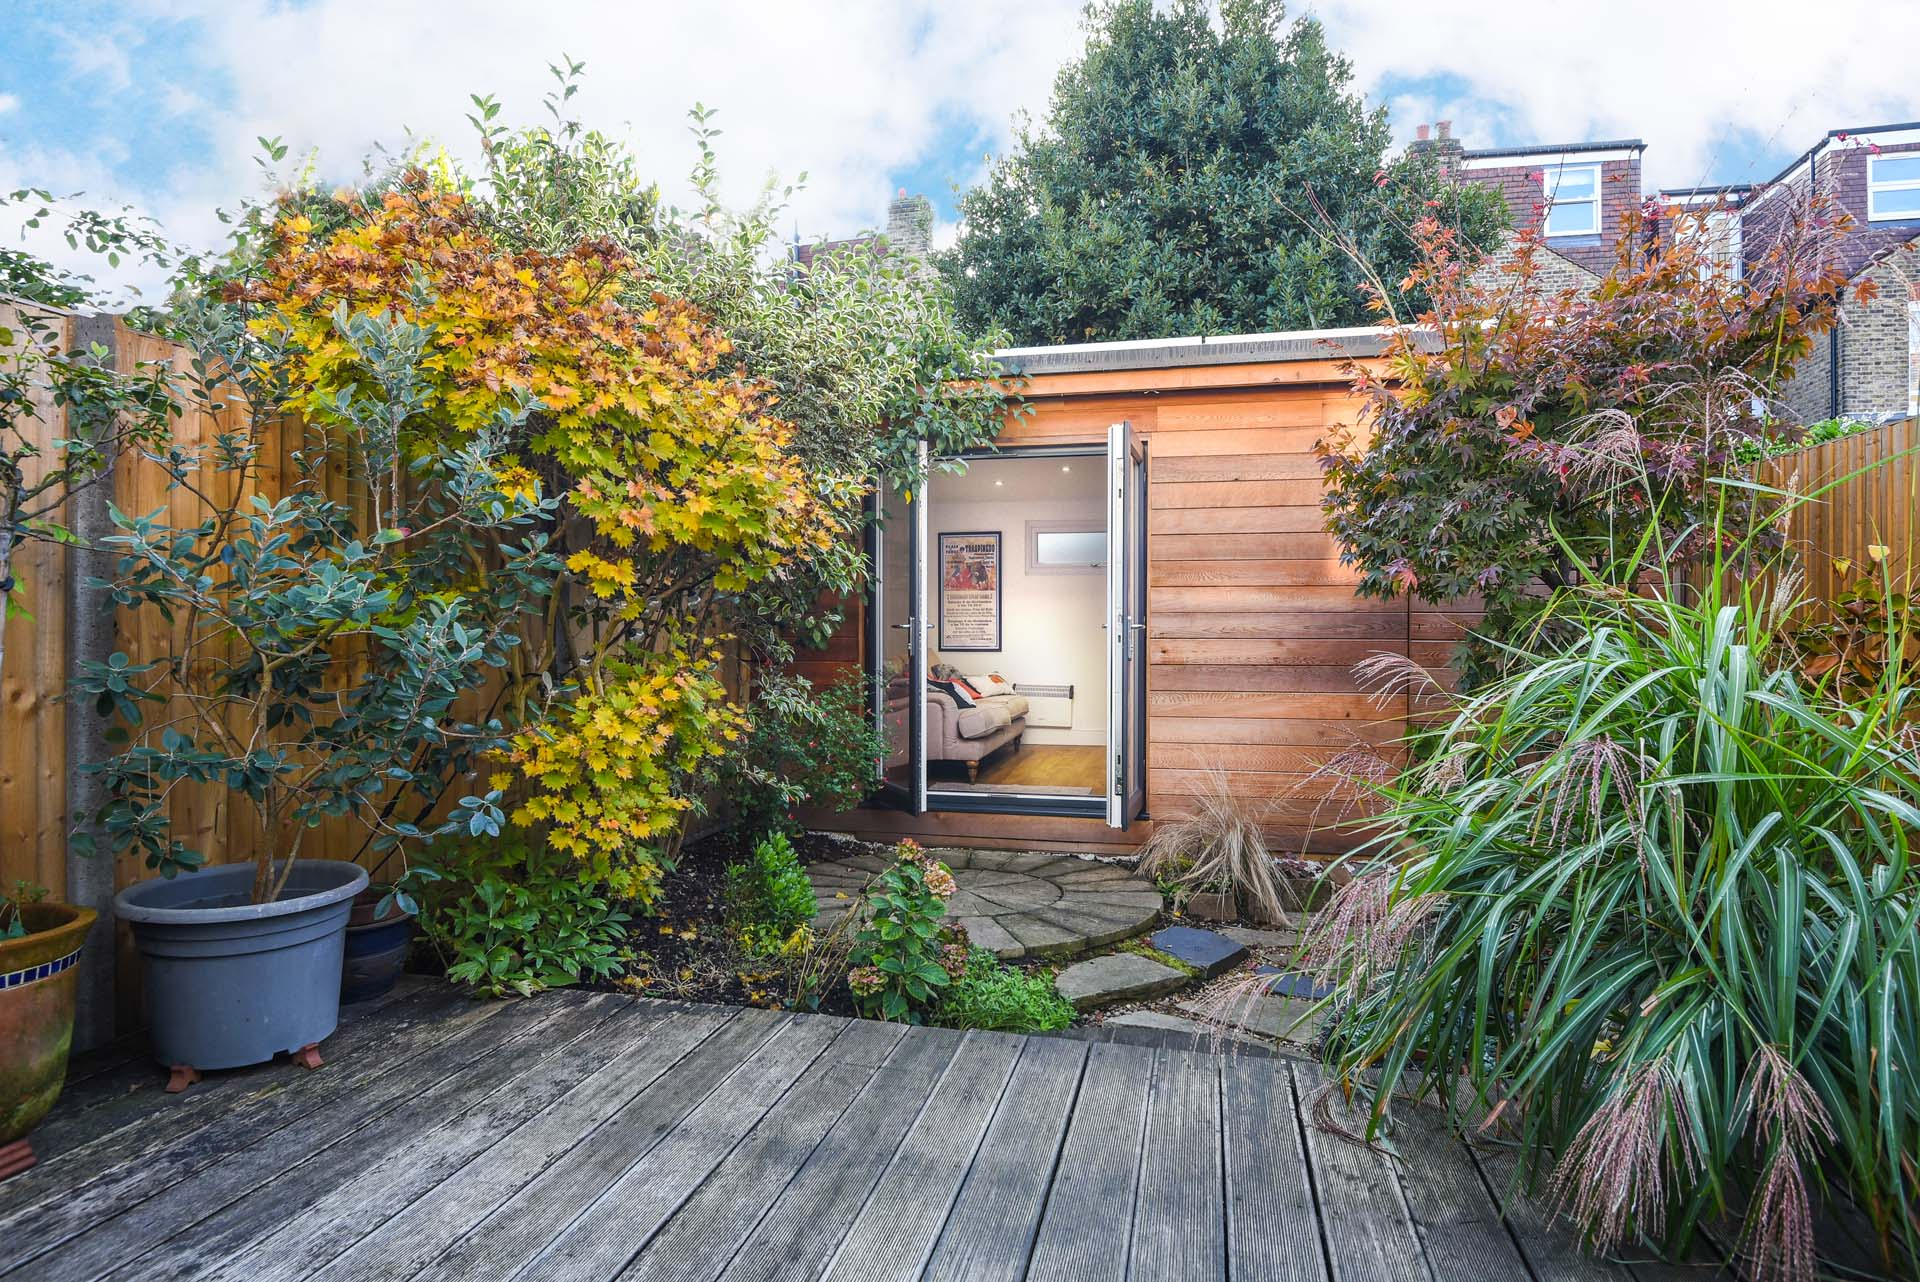 Garden room annexes